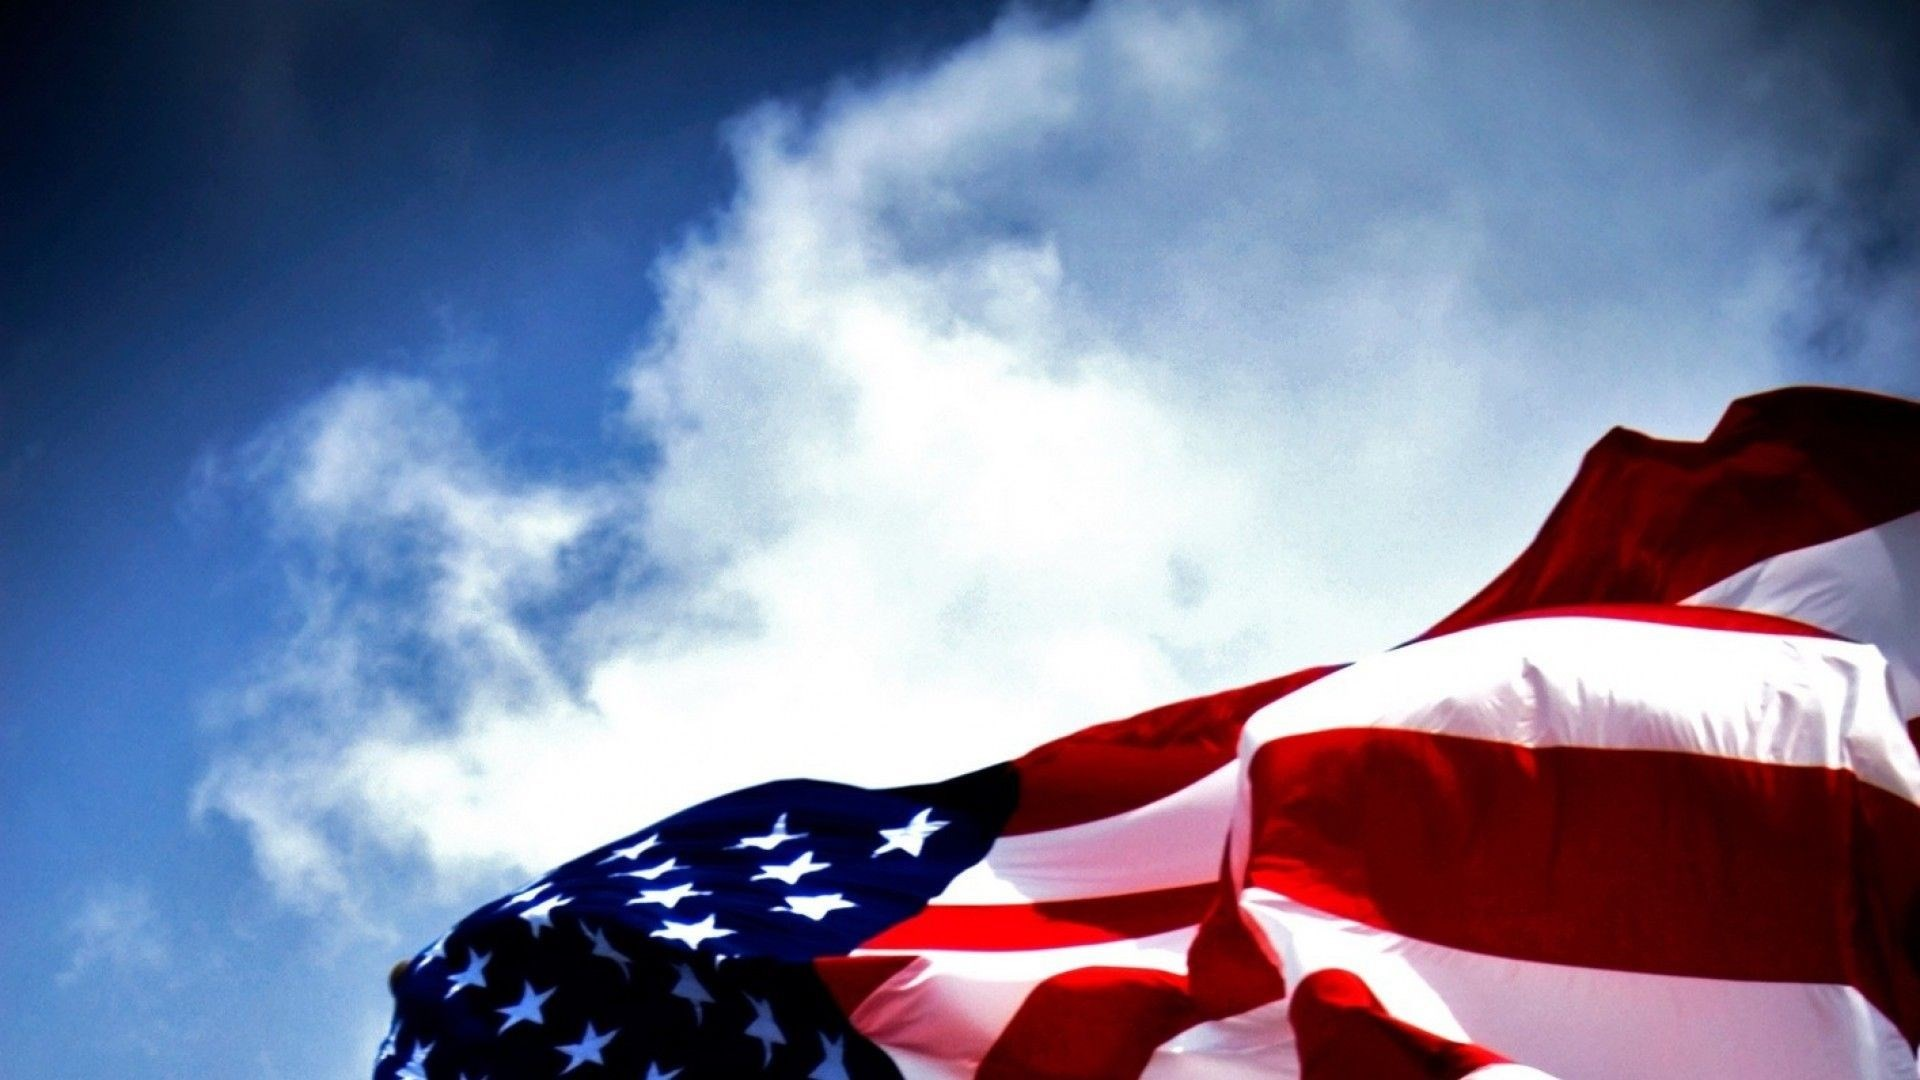 Hd wallpaper usa – Hd Wallpaper Usa Flag American Flag Wallpaper Pack 1080p  Hd